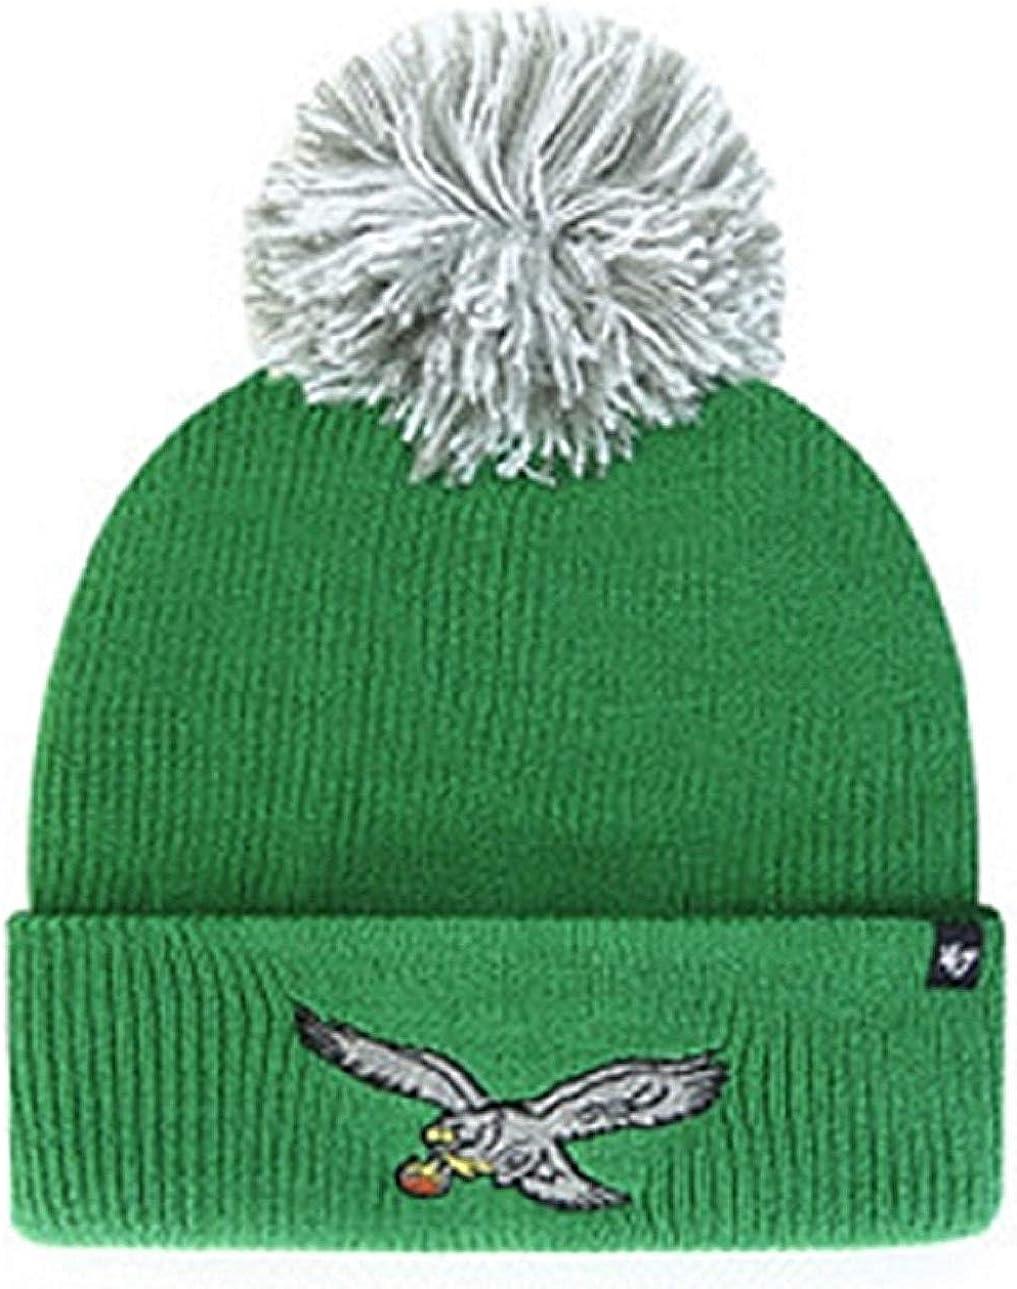 NFL Premium Cuffed Winter Knit Toque Cap 47 Brand Fashion Cuff Beanie Hat with POM POM